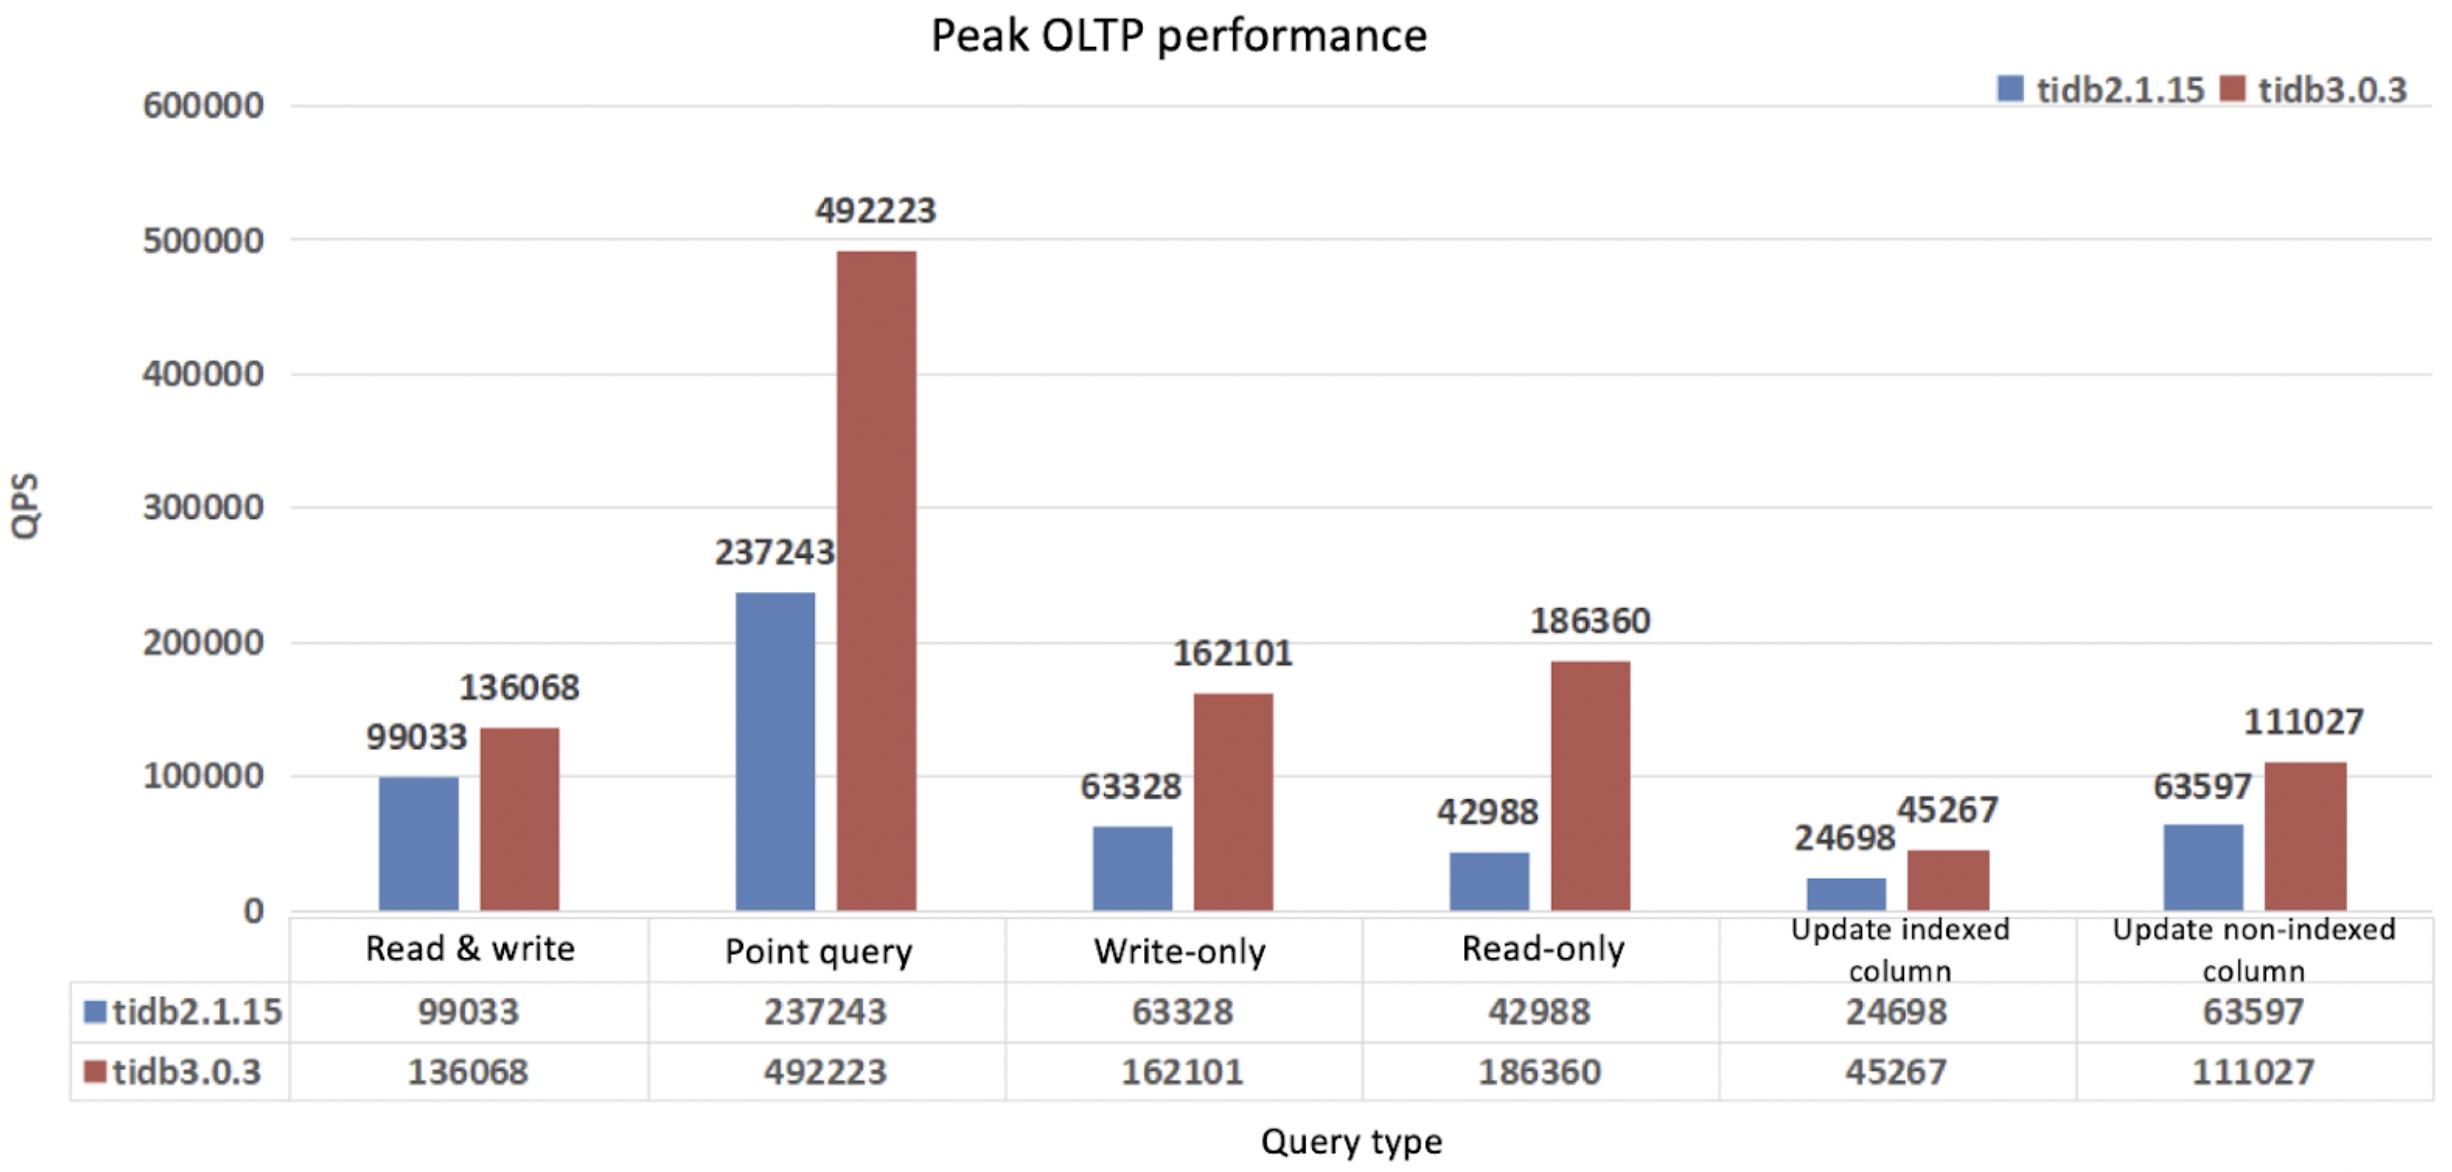 Peak OLTP performance comparison